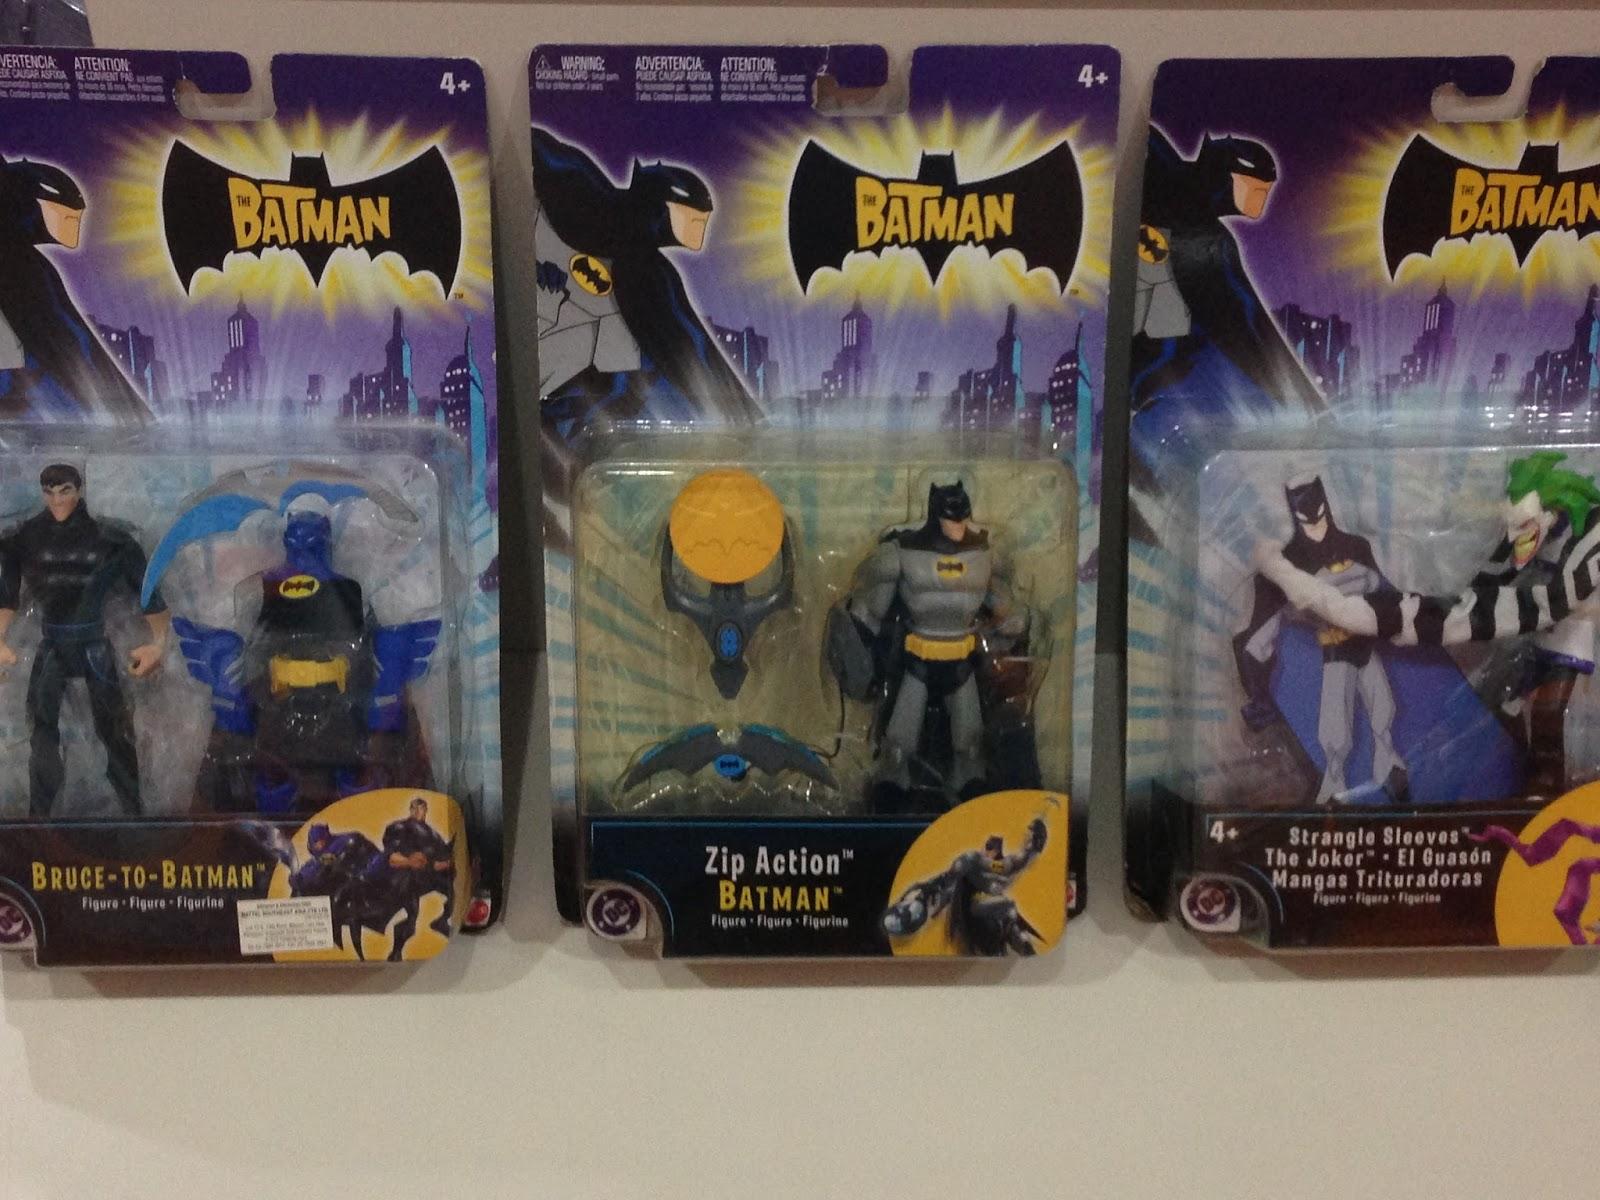 Mattel Batman Begins The Dark Knight Superman Returns Marvel Super Heroes Etc Vintage Available For Sale